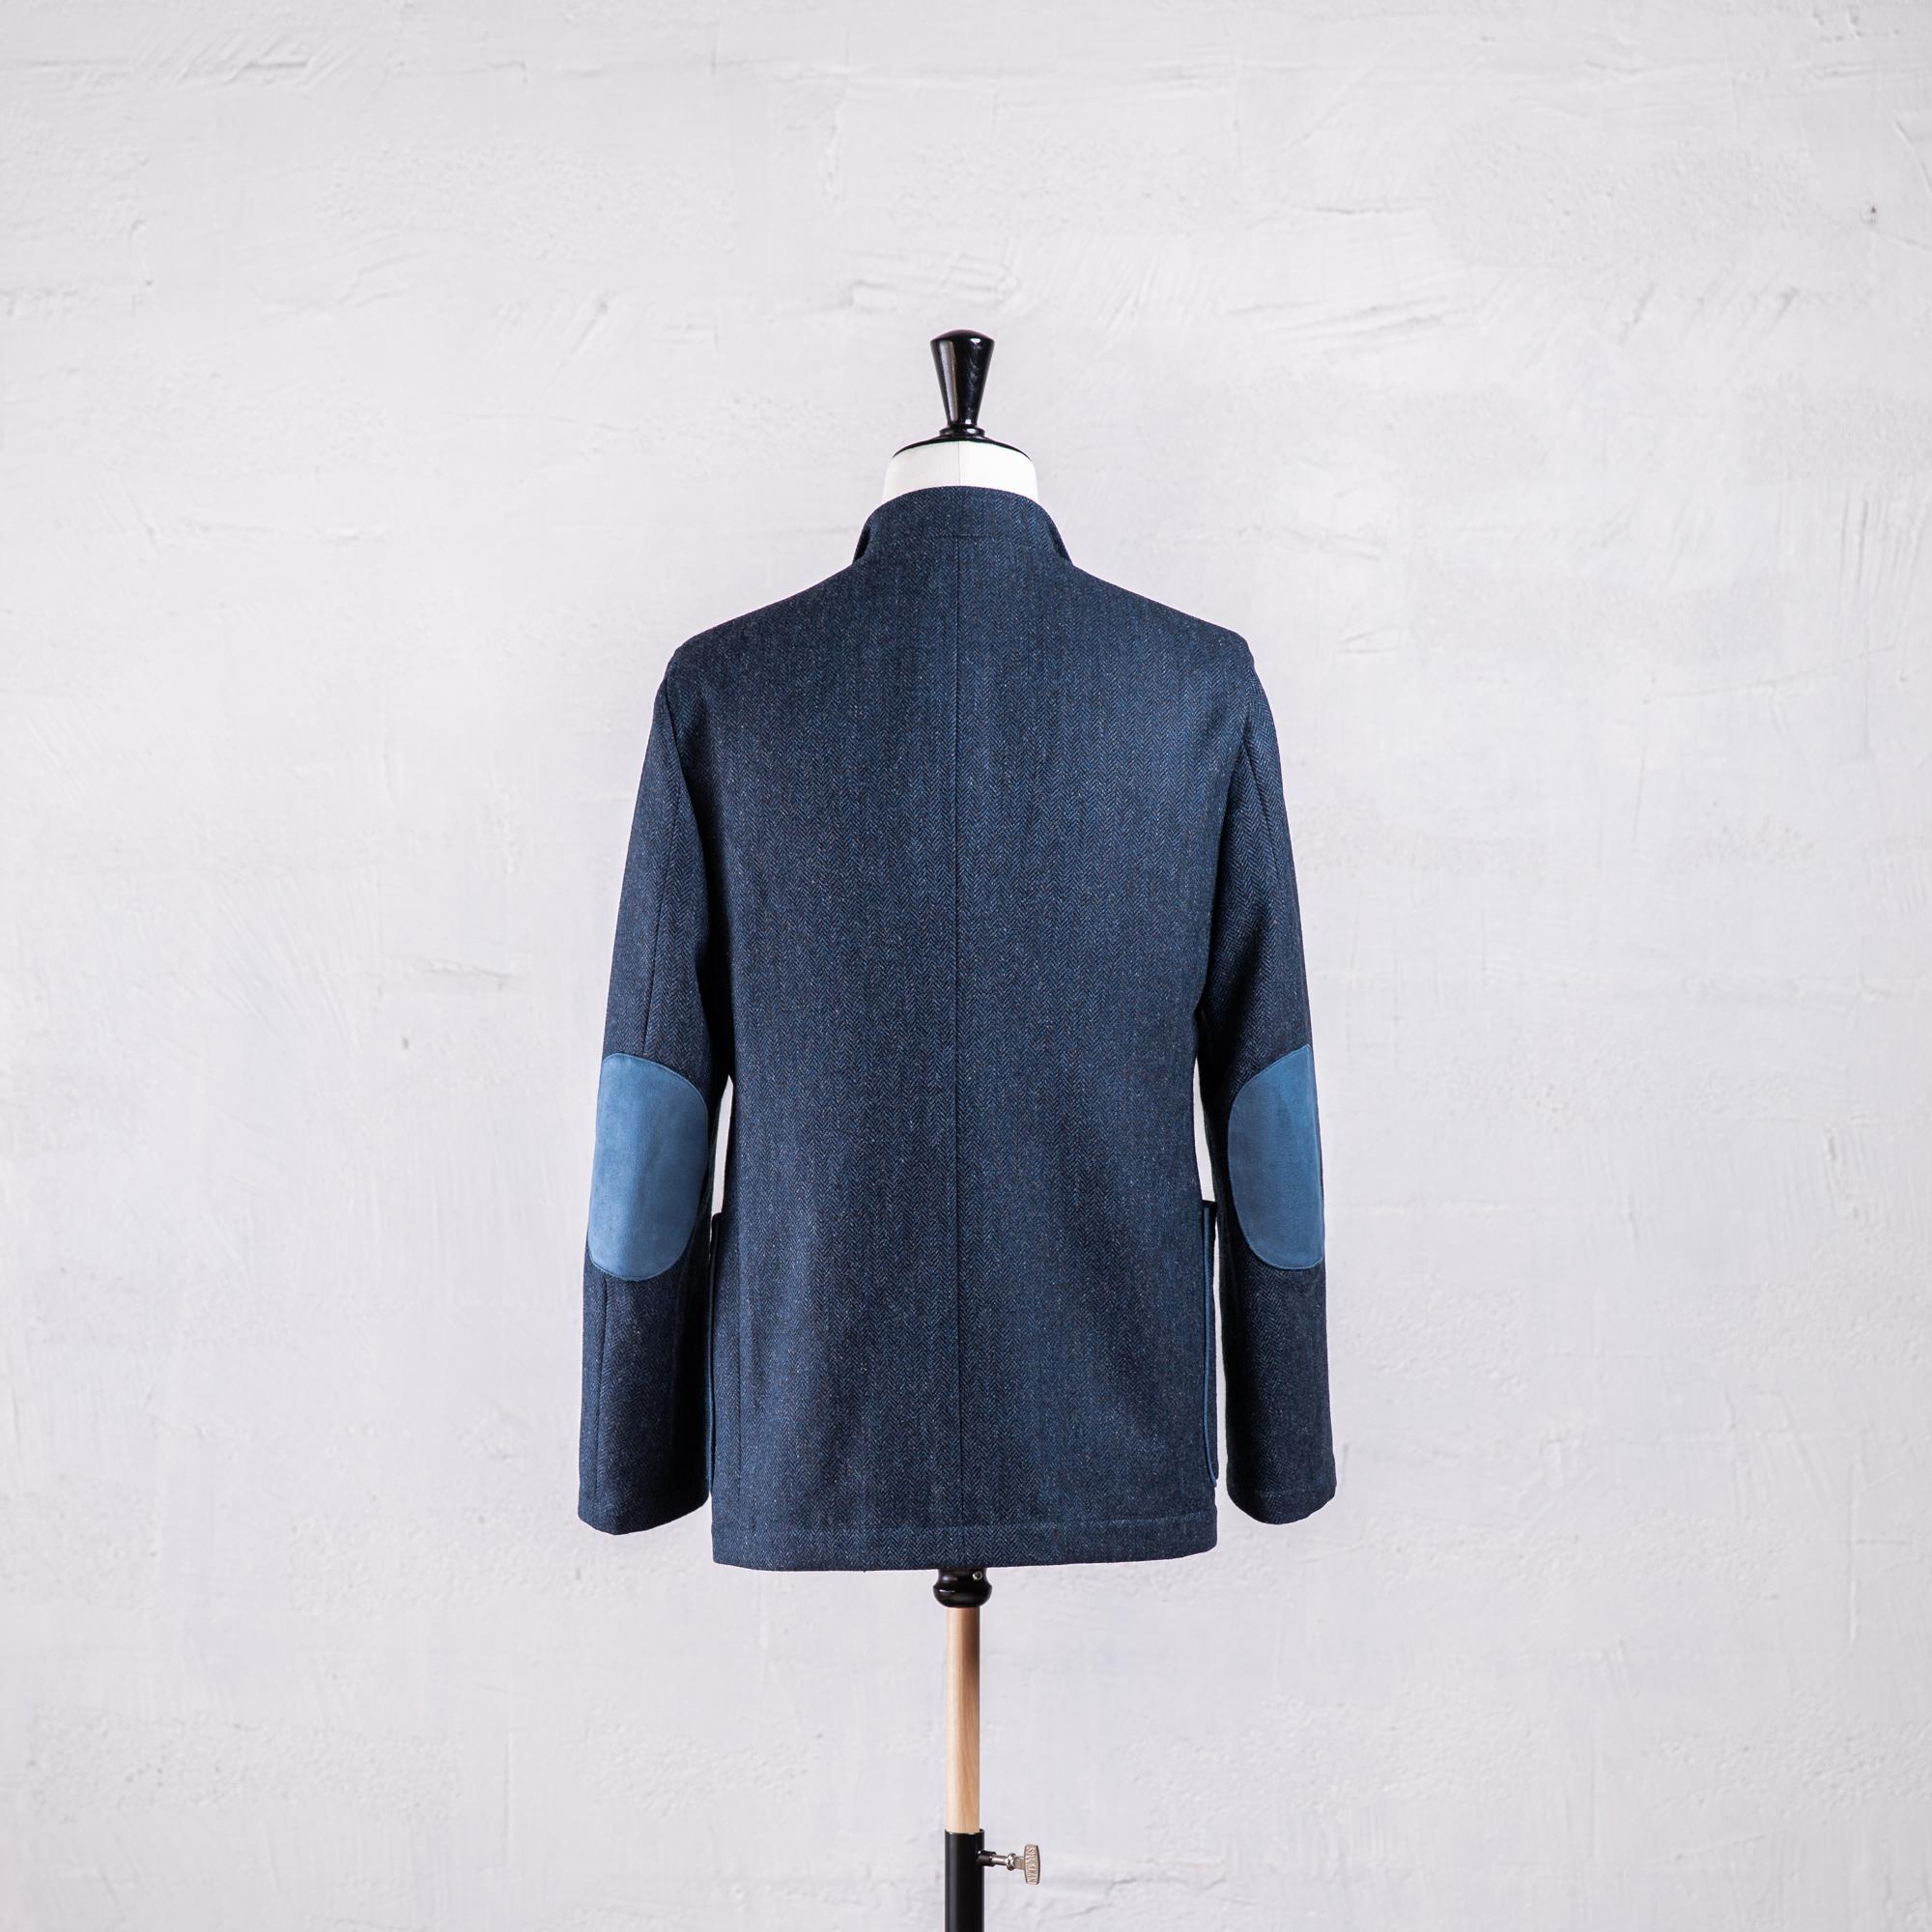 veste droite en tweed bleu Caminel